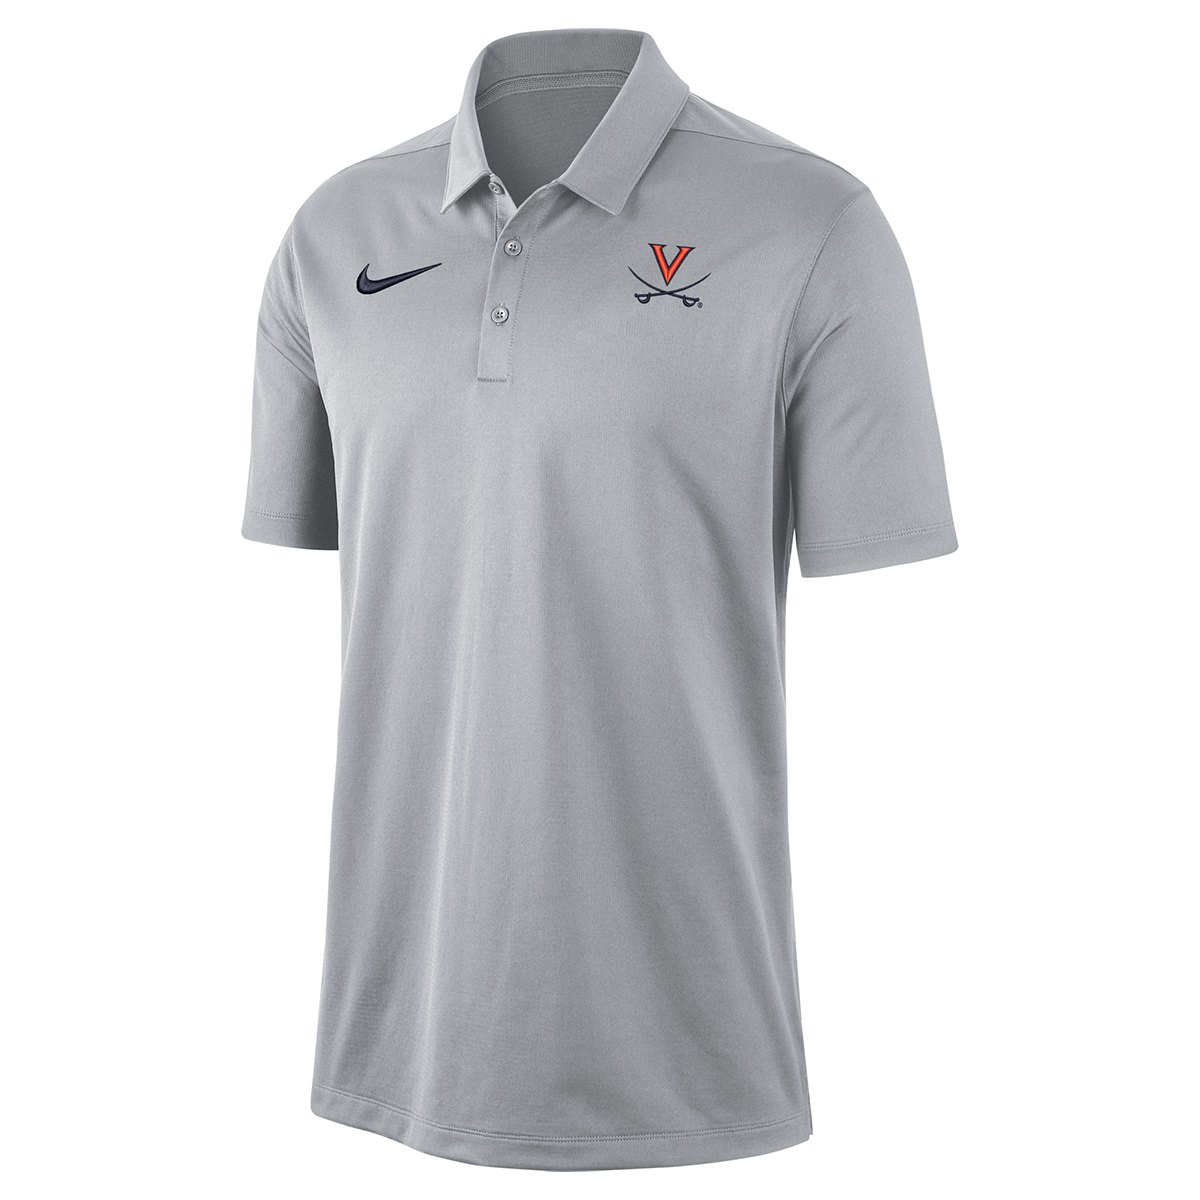 University of Virginia Nike Grey Polo